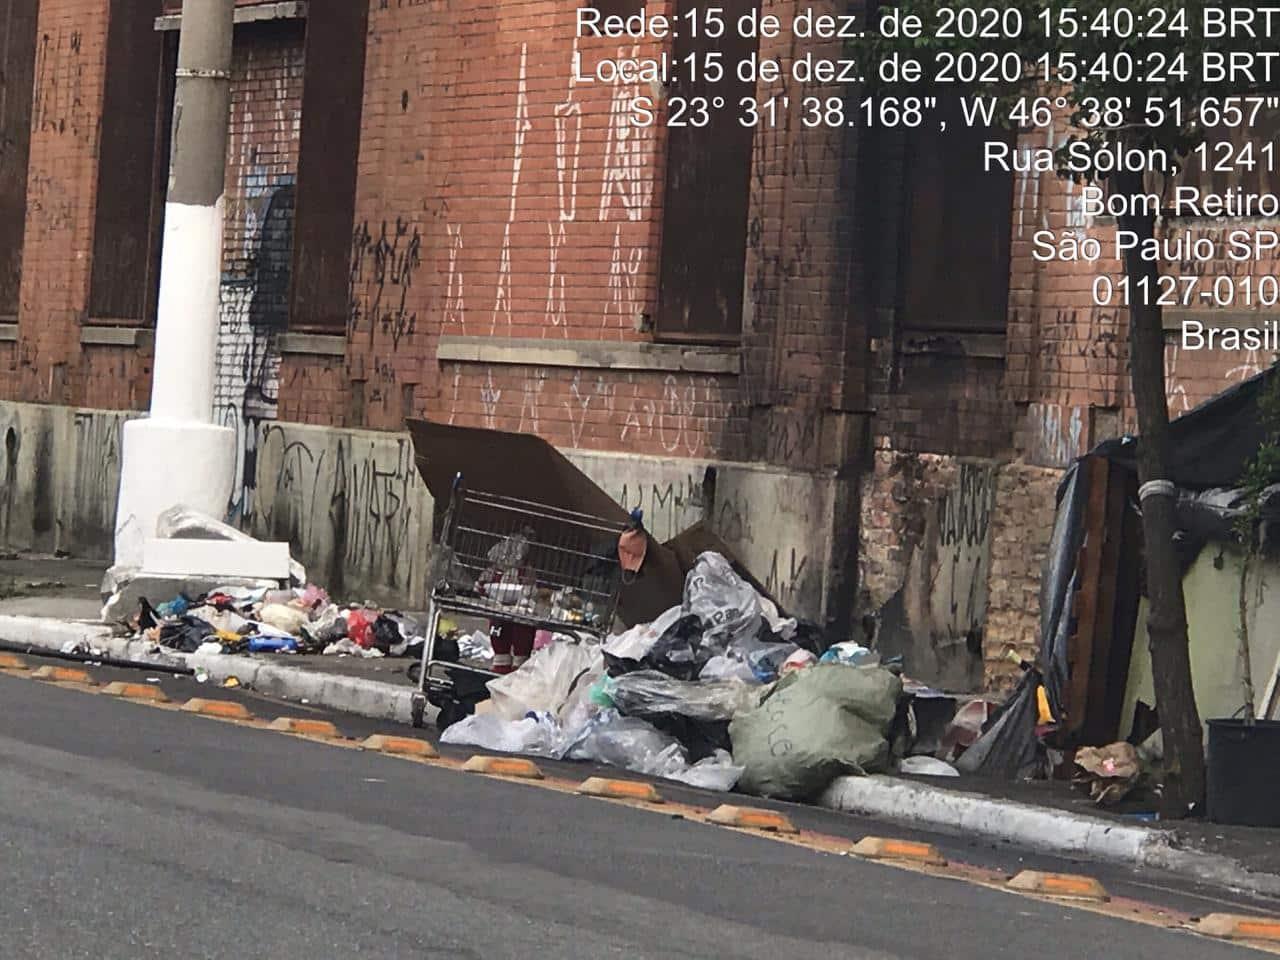 Rua Solon 3 Ajuda SP Centro